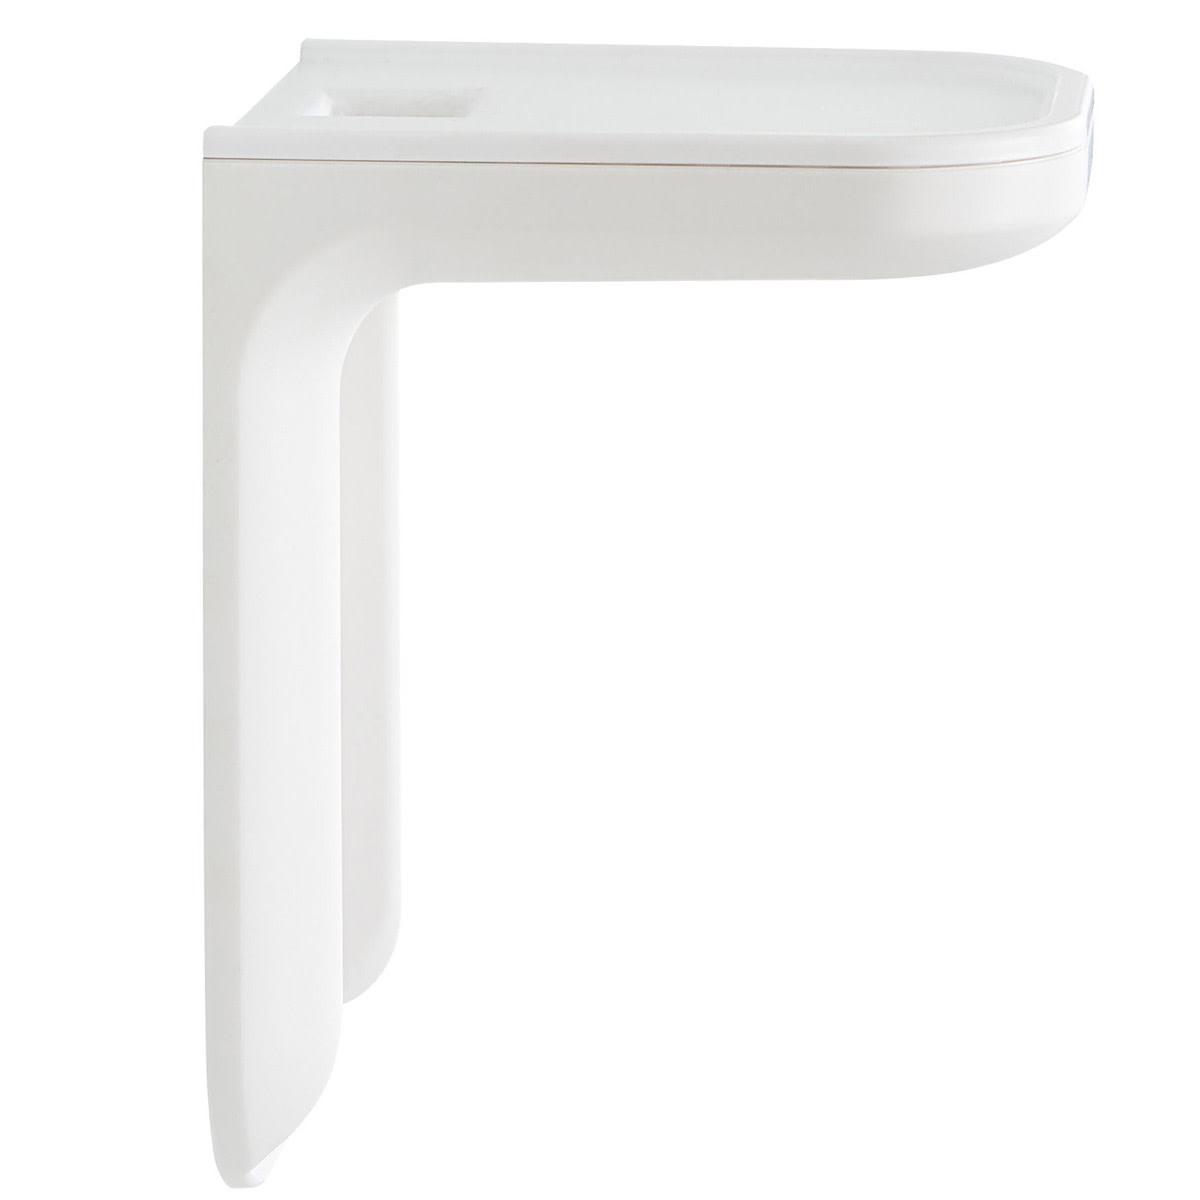 Sanus Outlet Shelf